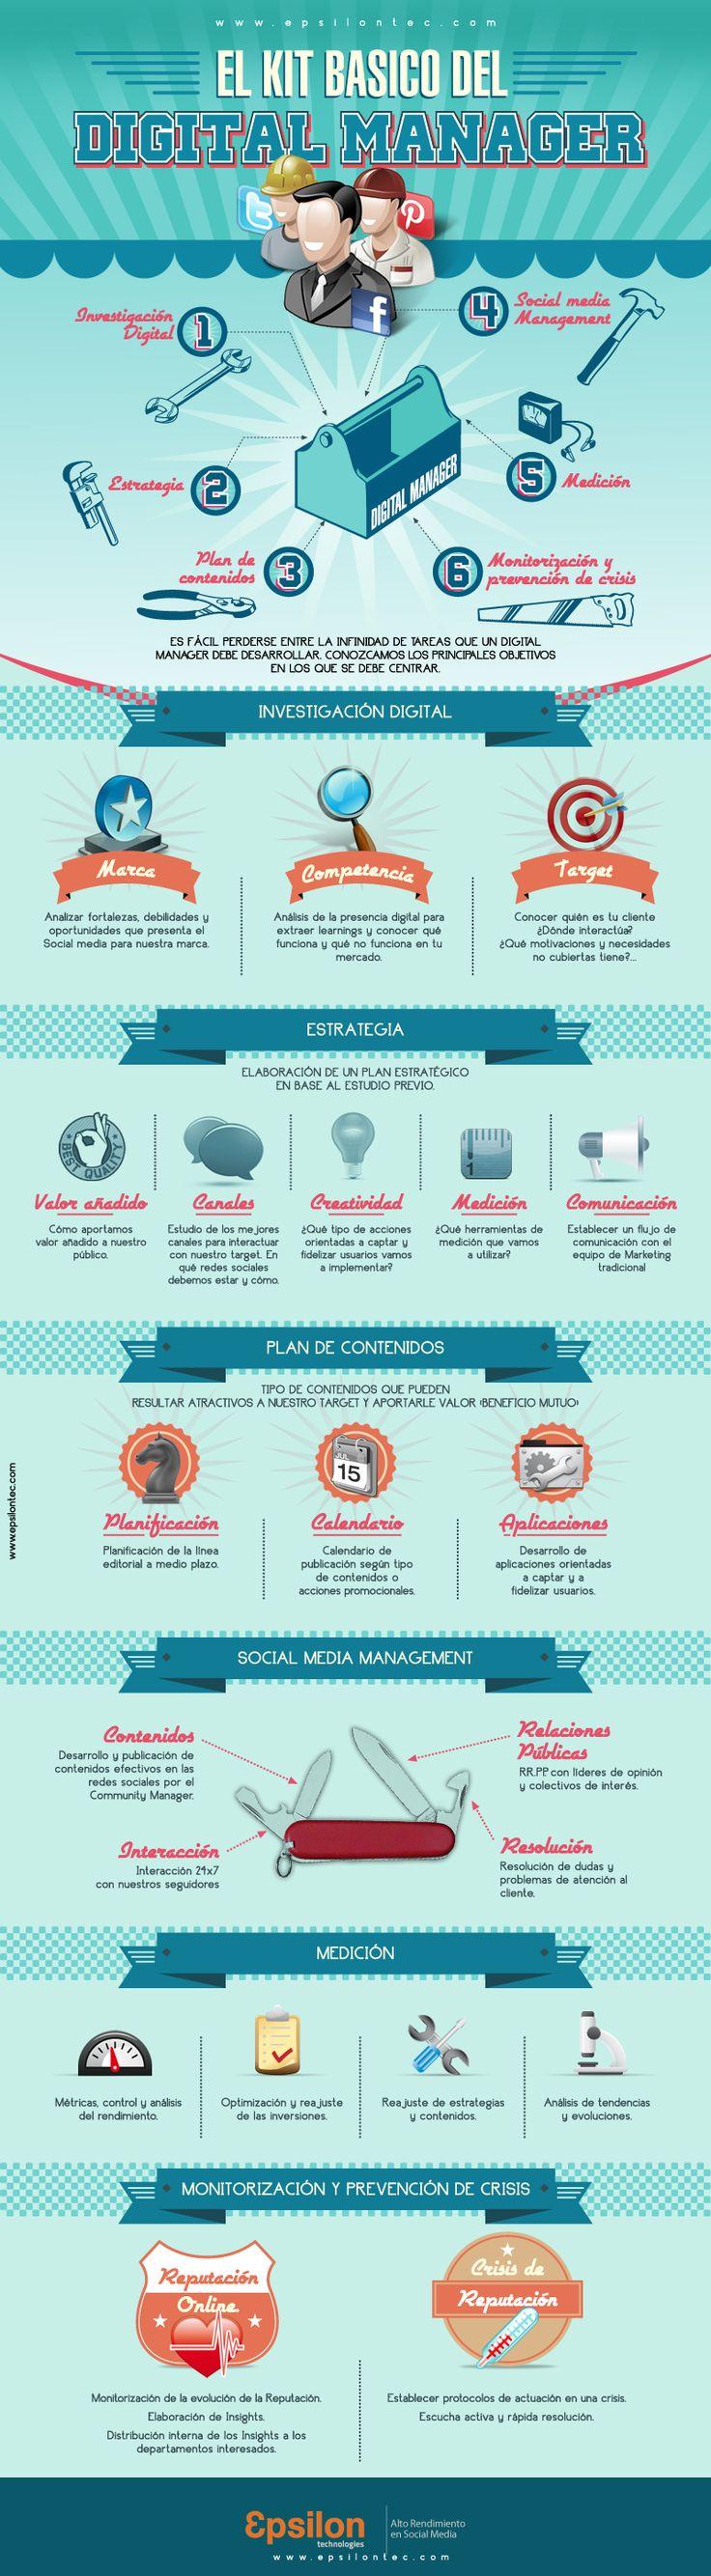 El kit básico de Digital Manager en Social Media #RedCreativa